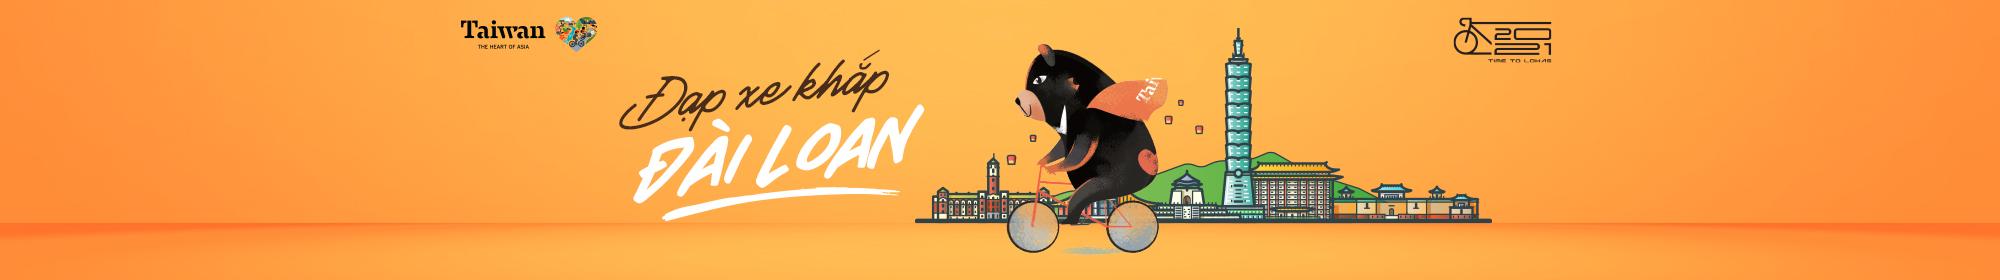 Taiwan 2021 _ Year of Cycling Tourism